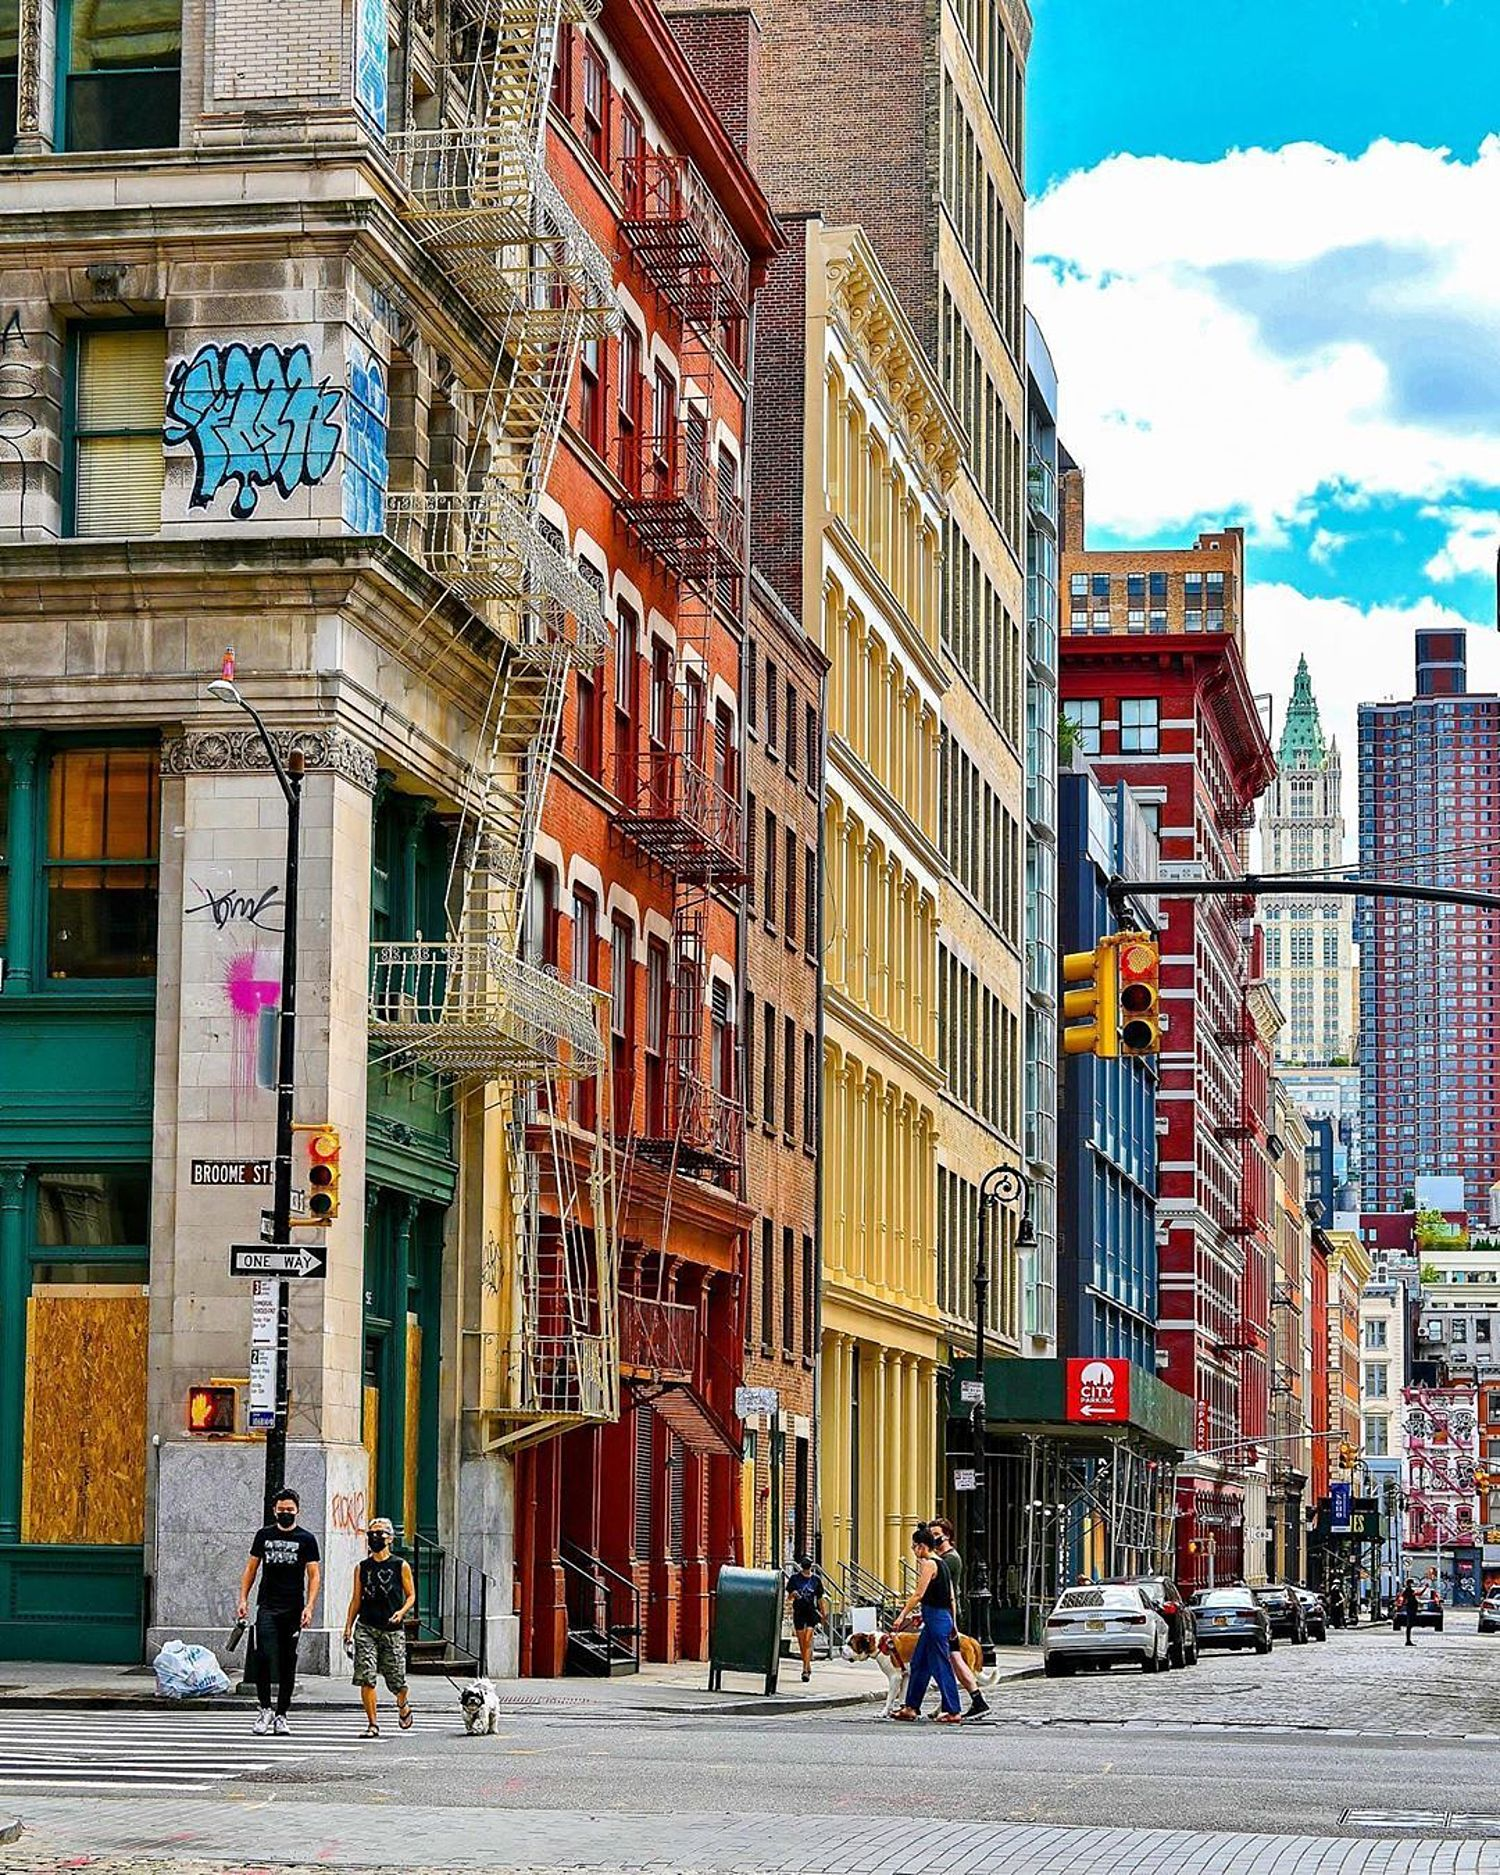 Broome Street and Mercer Street, SoHo, Manhattan